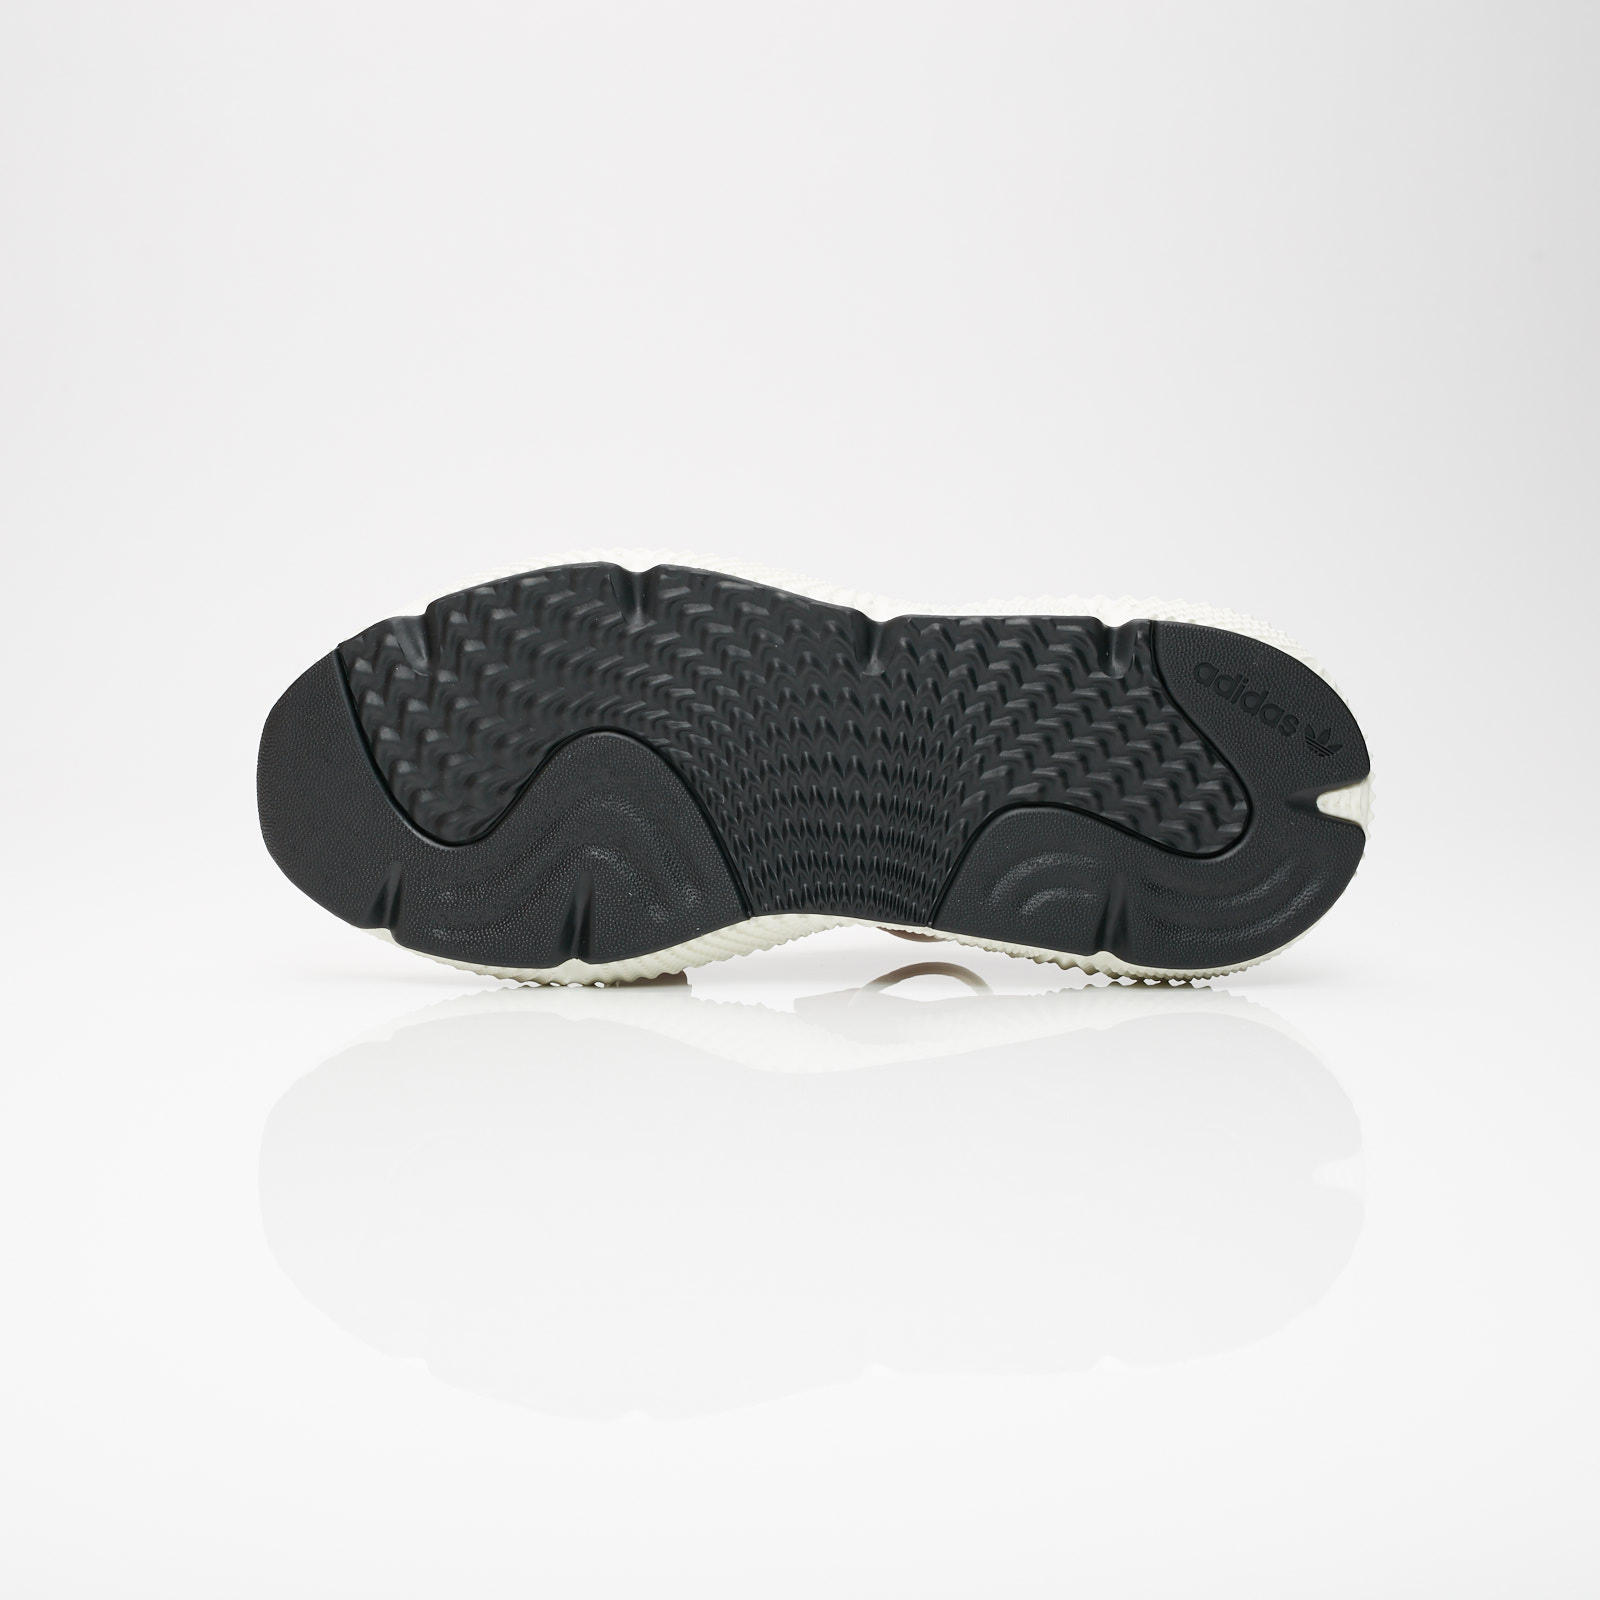 84fe9303dad5 adidas Prophere - D96658 - Sneakersnstuff